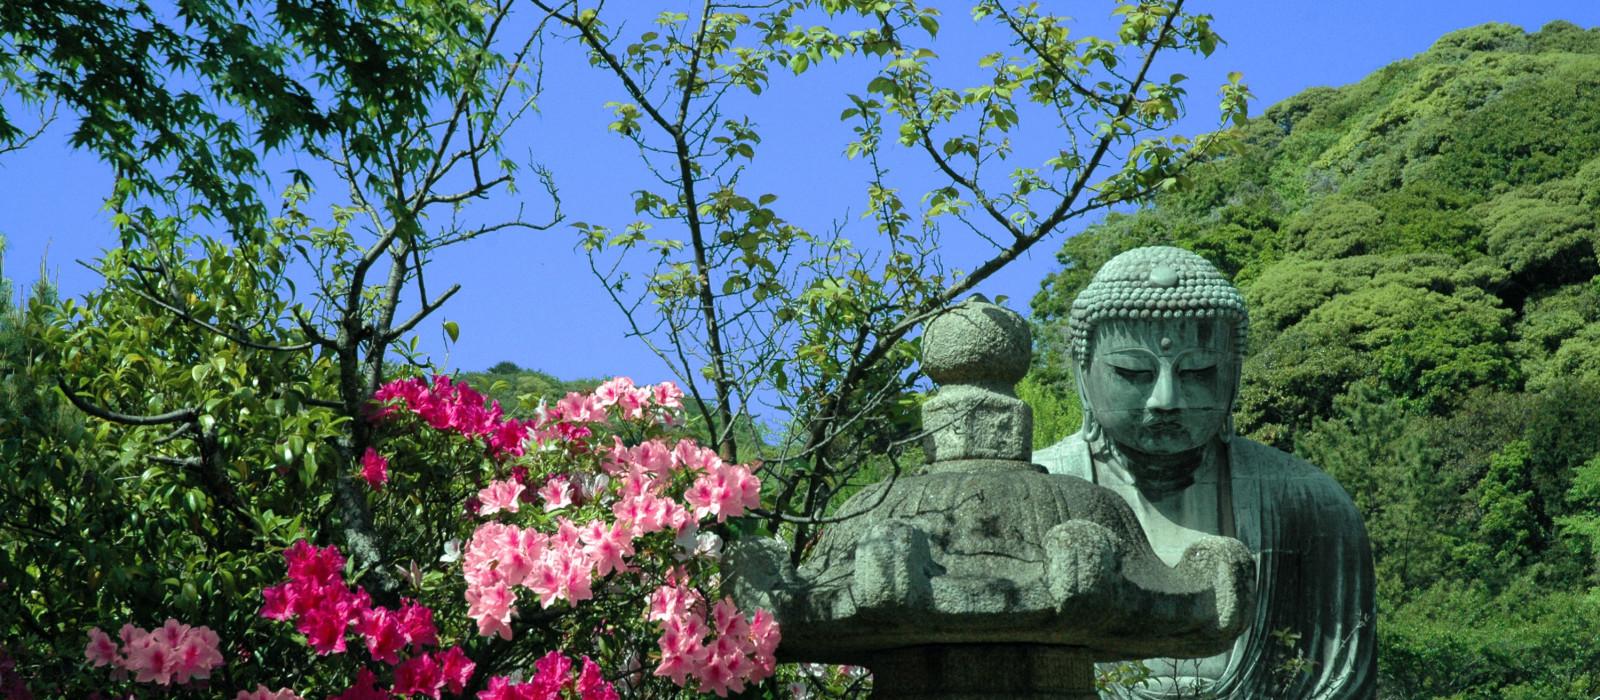 Destination Kamakura Japan